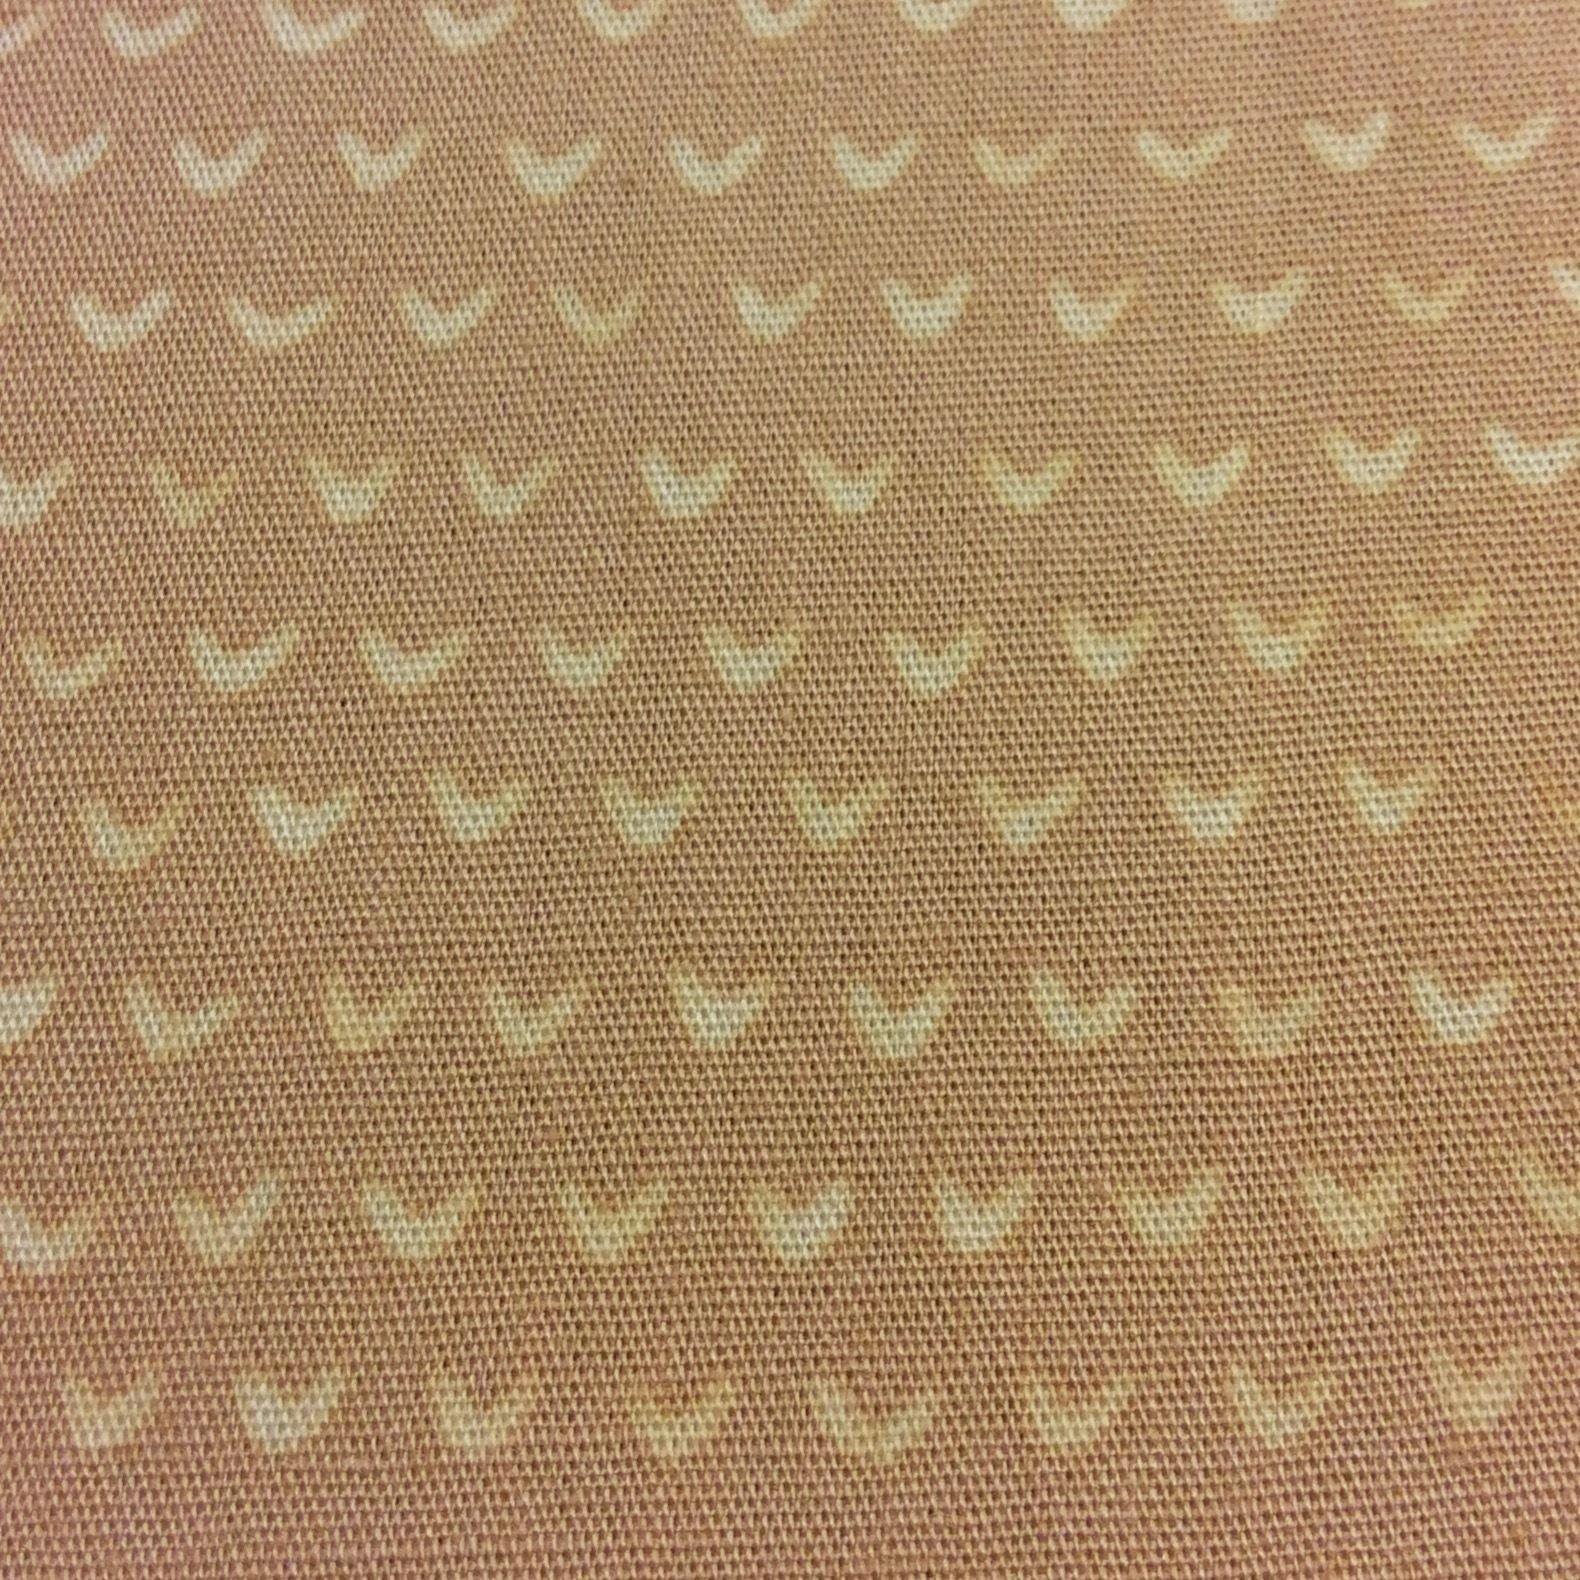 Batik Boho Modern Retro Hand Dyed Printed Batik Mini Print Cotton Quilt Fabric HM16